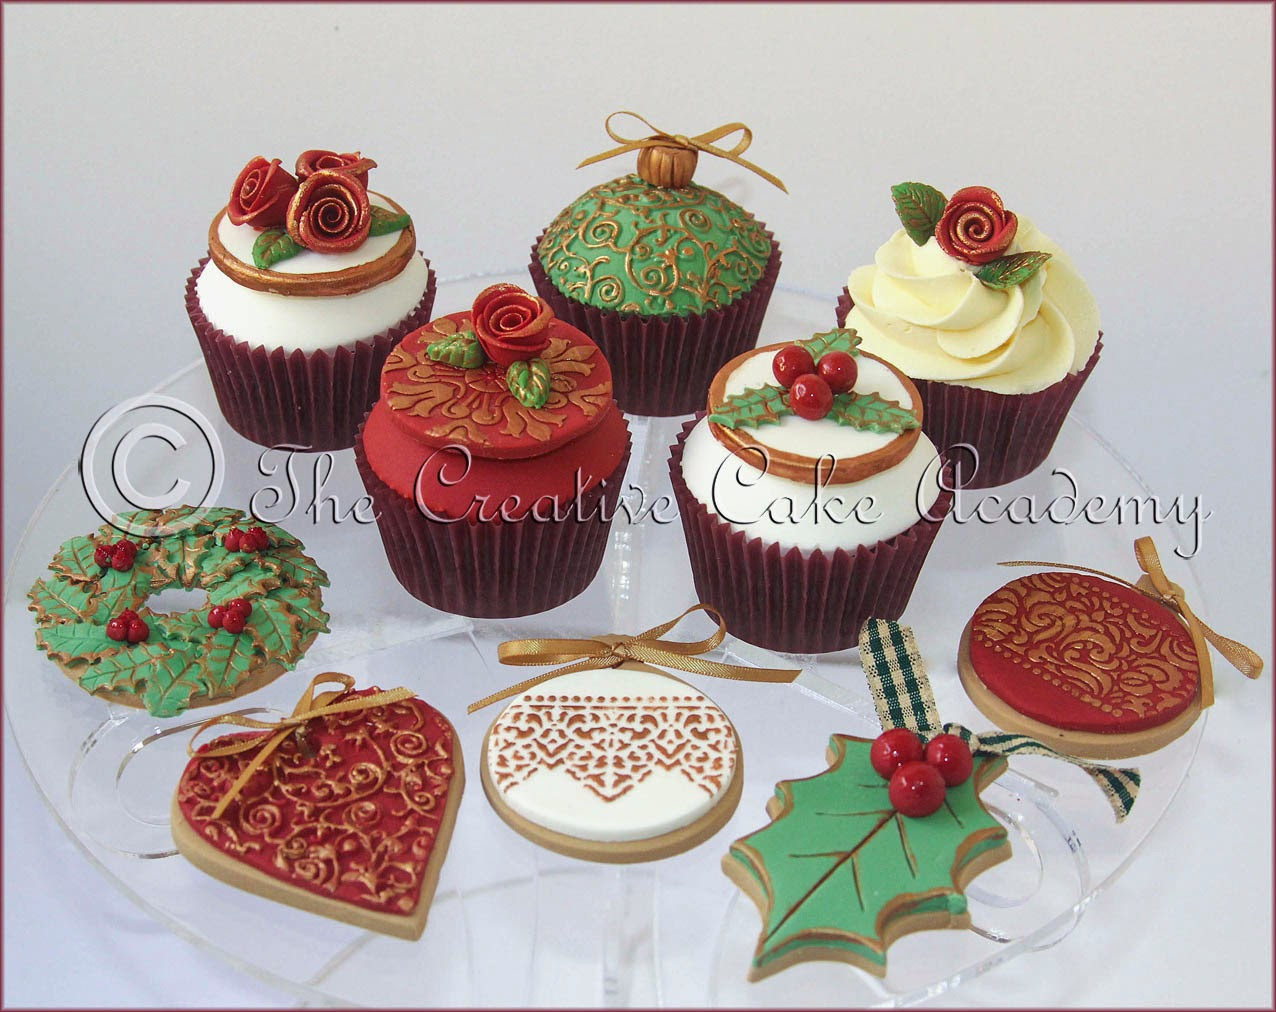 Christmas Cakes And Cupcakes  The Creative Cake Academy